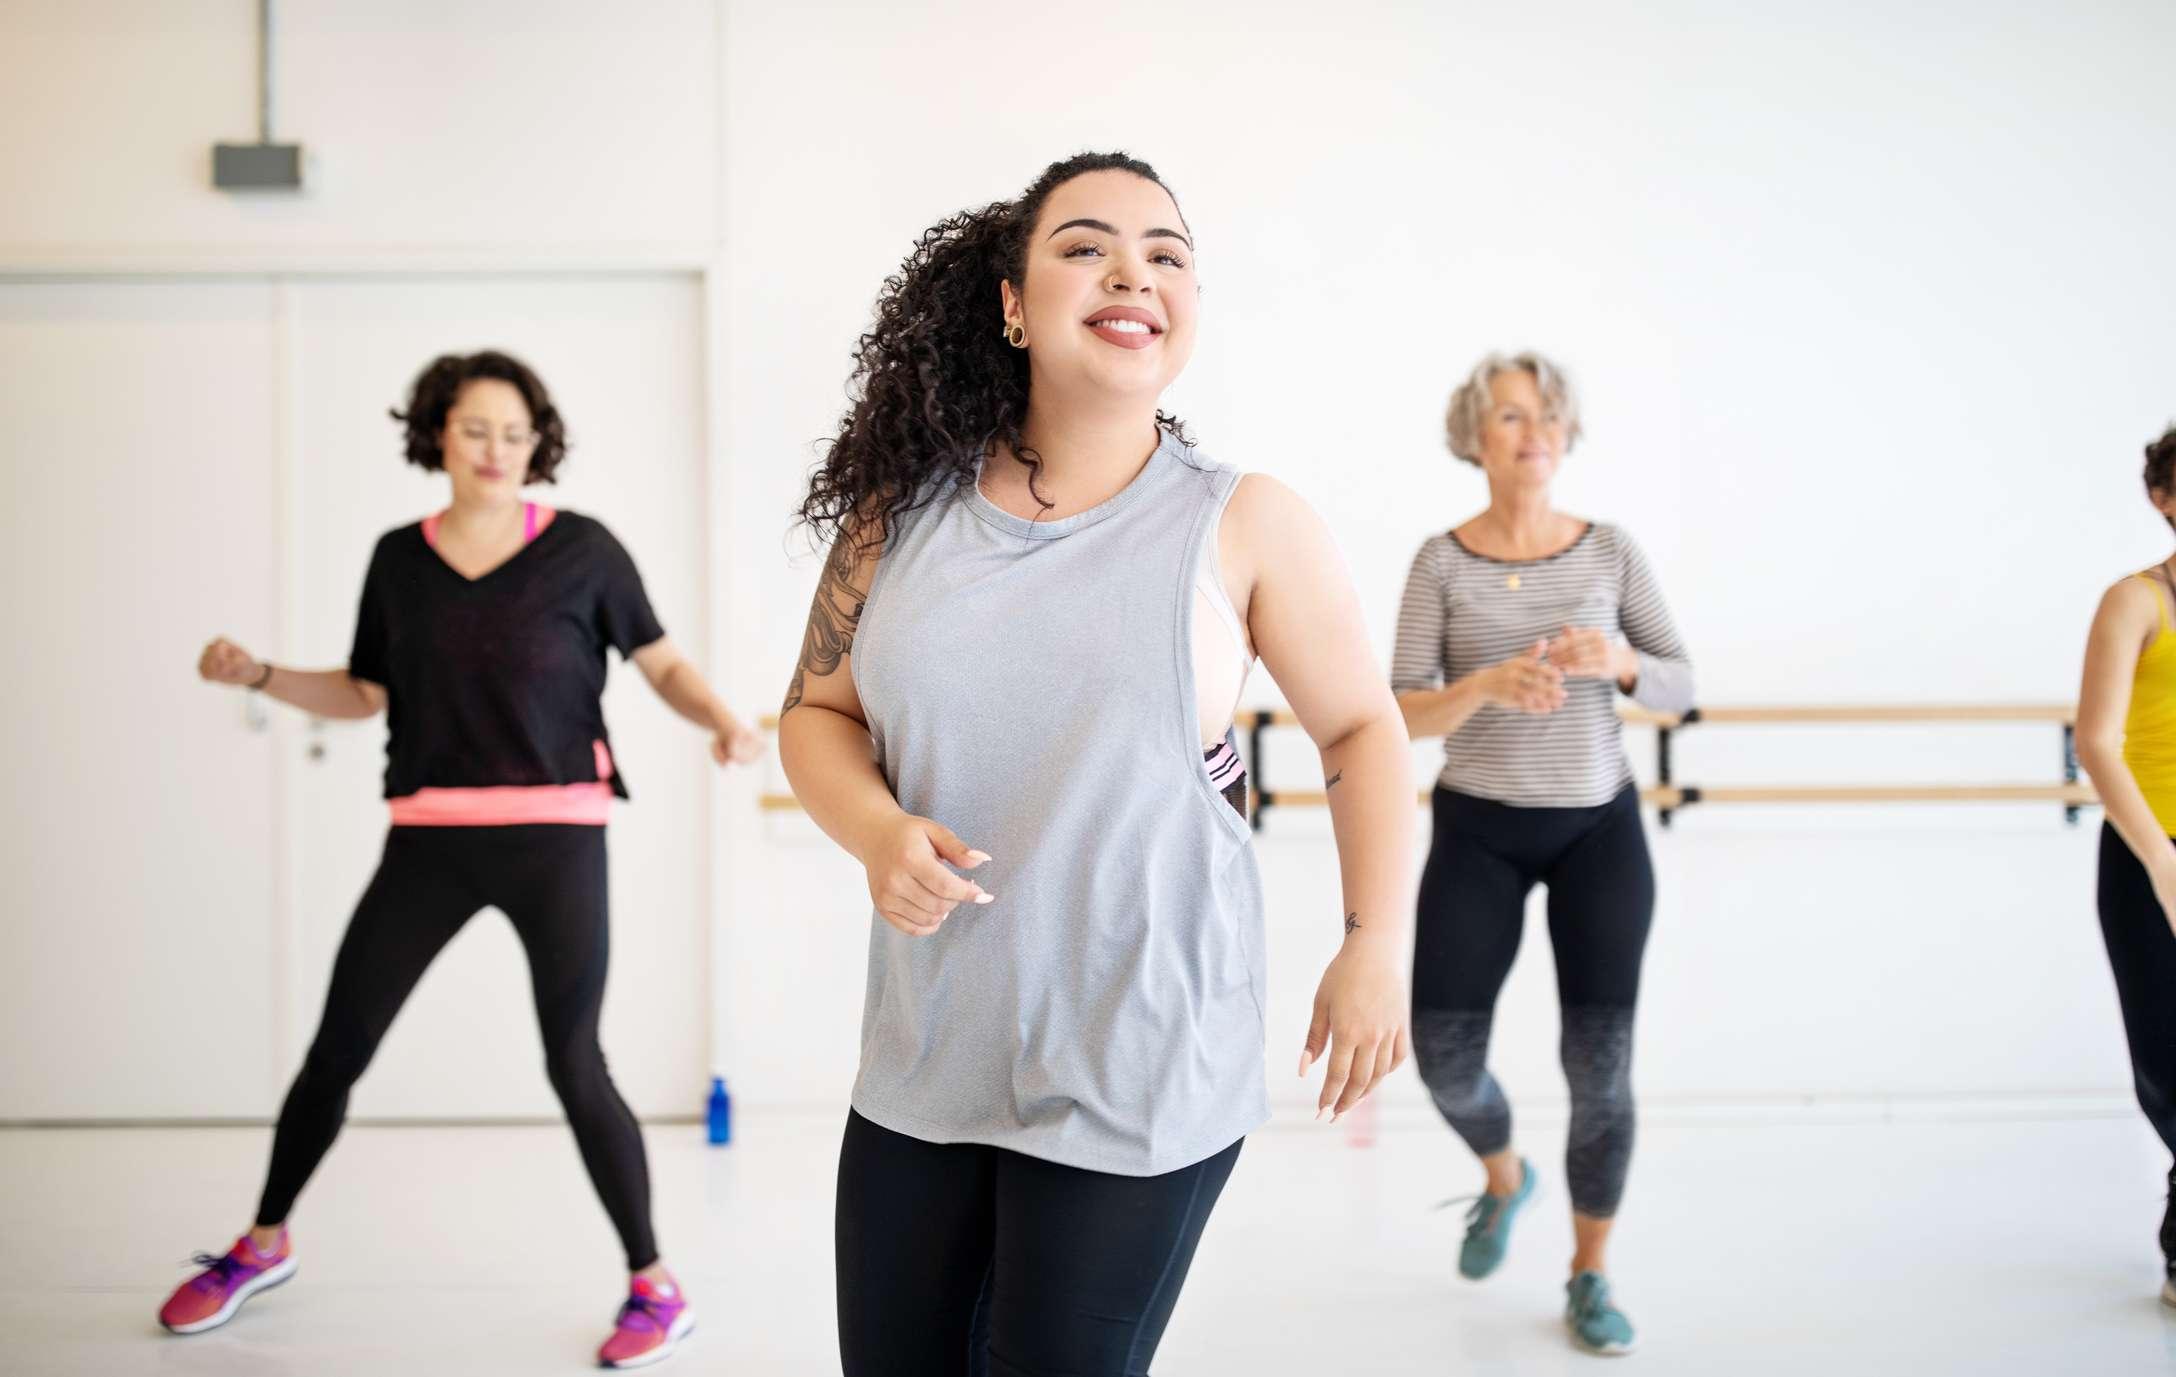 Women move in dance class